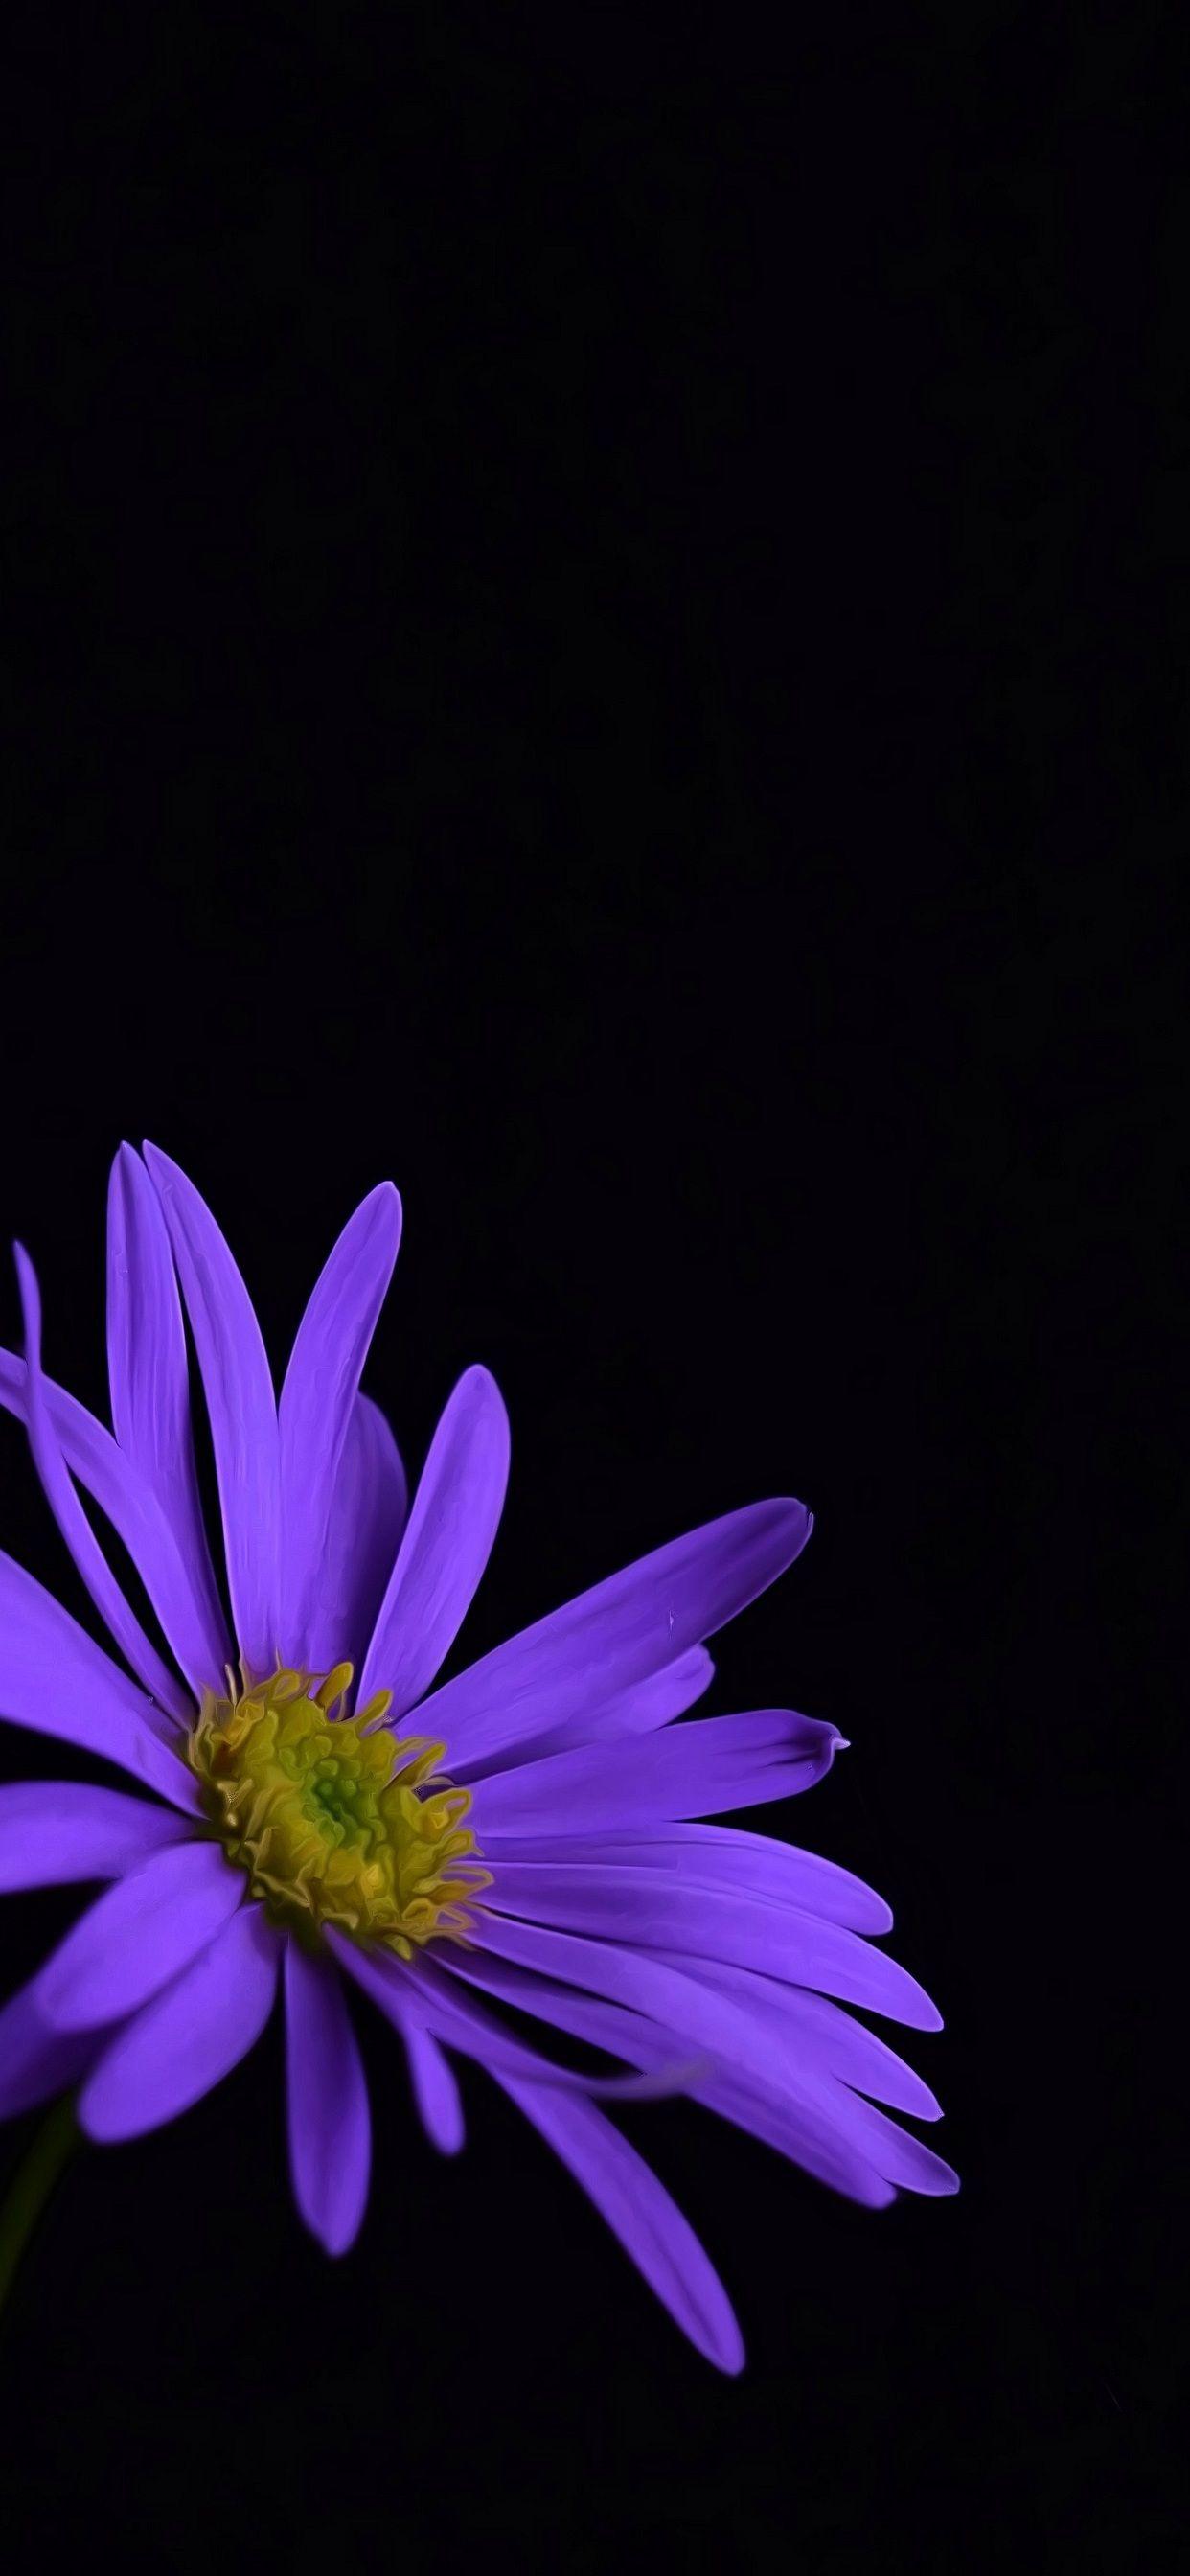 Pin By Satbir Kaur On R In 2020 Purple Flowers Wallpaper Flower Iphone Wallpaper Apple Wallpaper Iphone